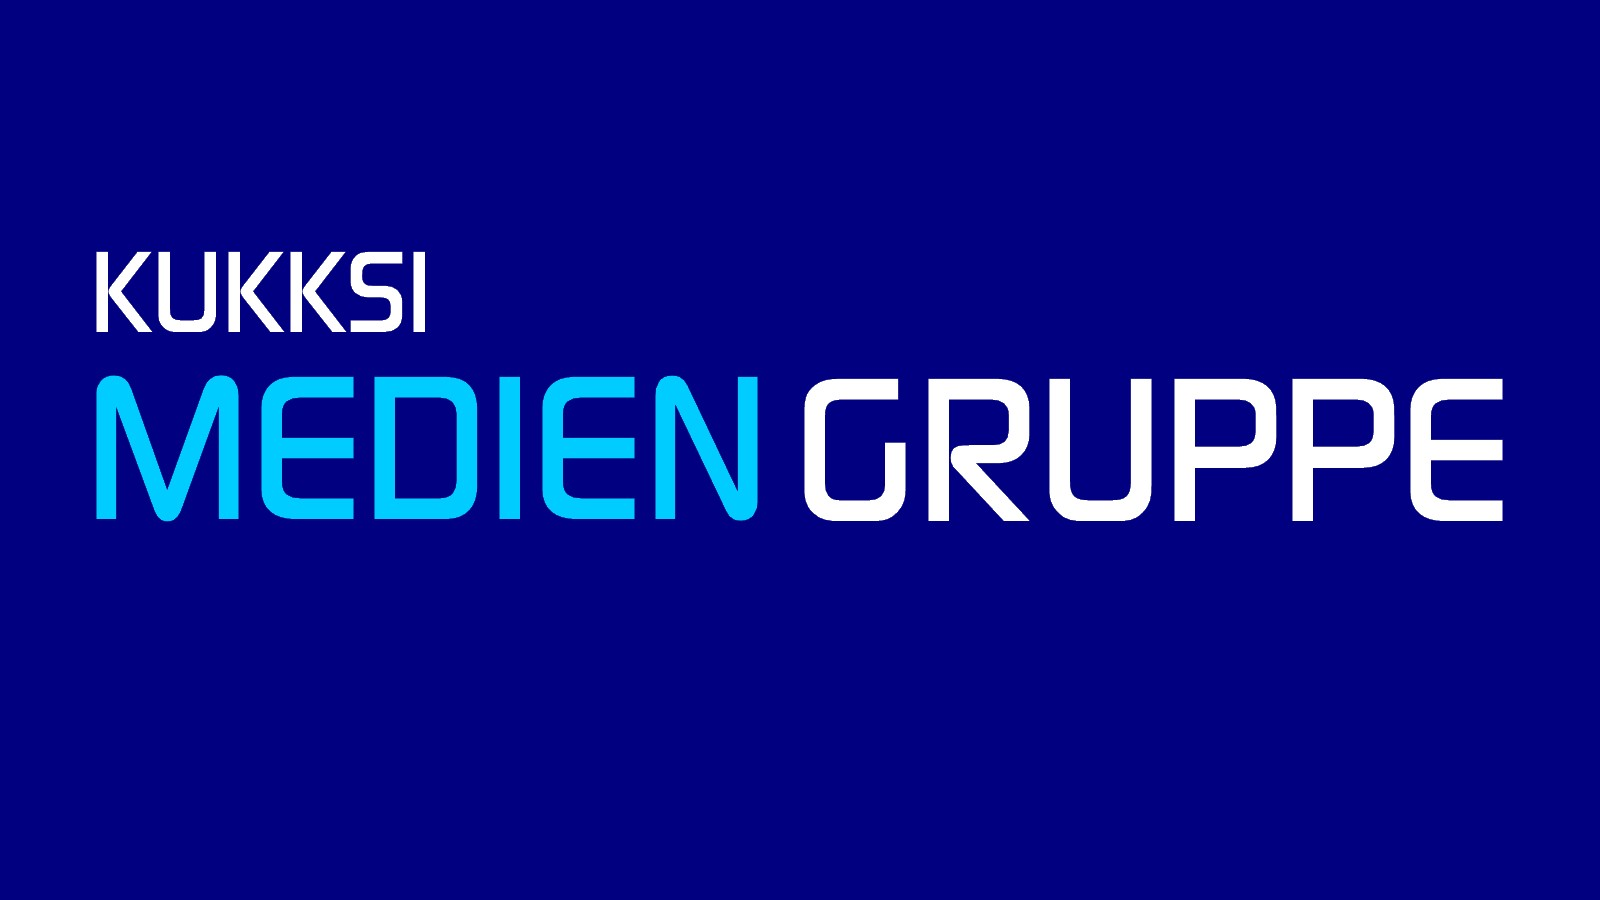 KUKKSI Mediengruppe